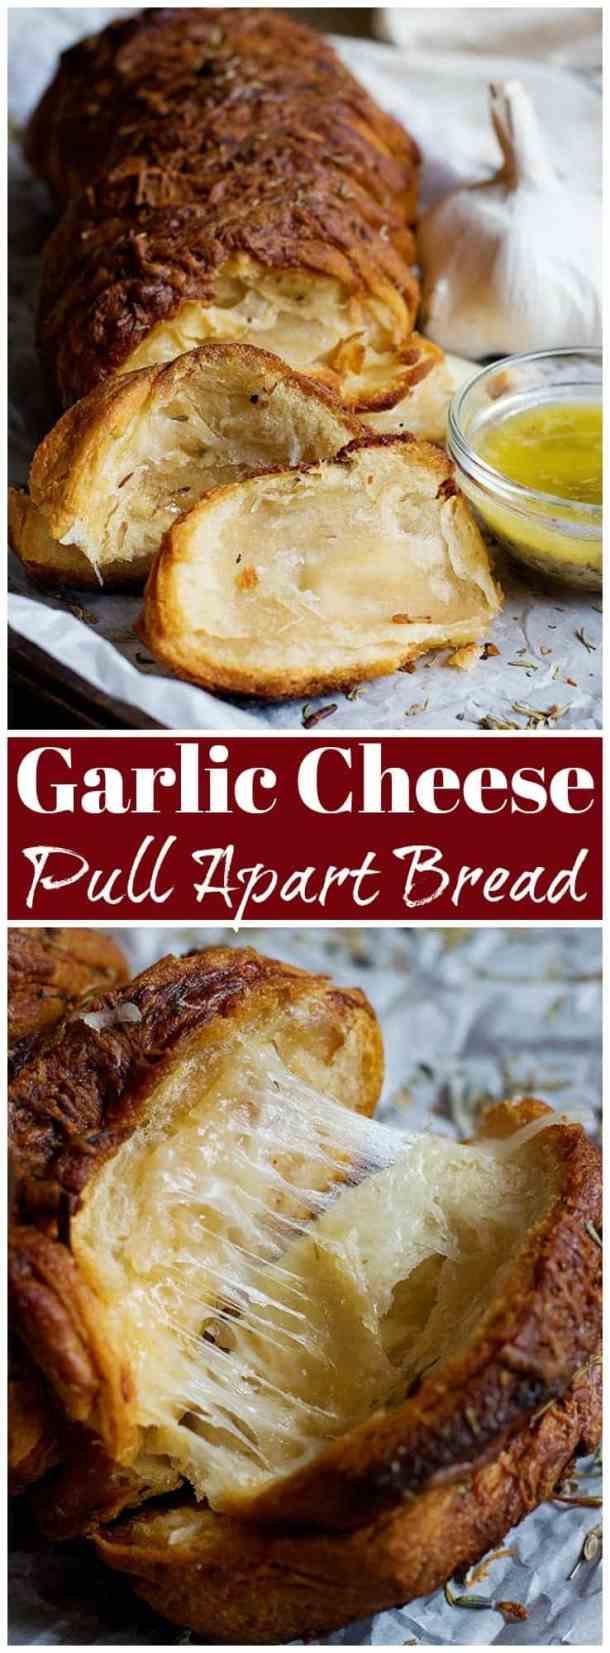 garlic cheese pull apart bread   garlic cheese pull apart bread Recipe   garlic cheese pull apart bread Appetizer   garlic cheese pull apart bread Party   #garlicpullapartbread #easypullapartbread #biscuit